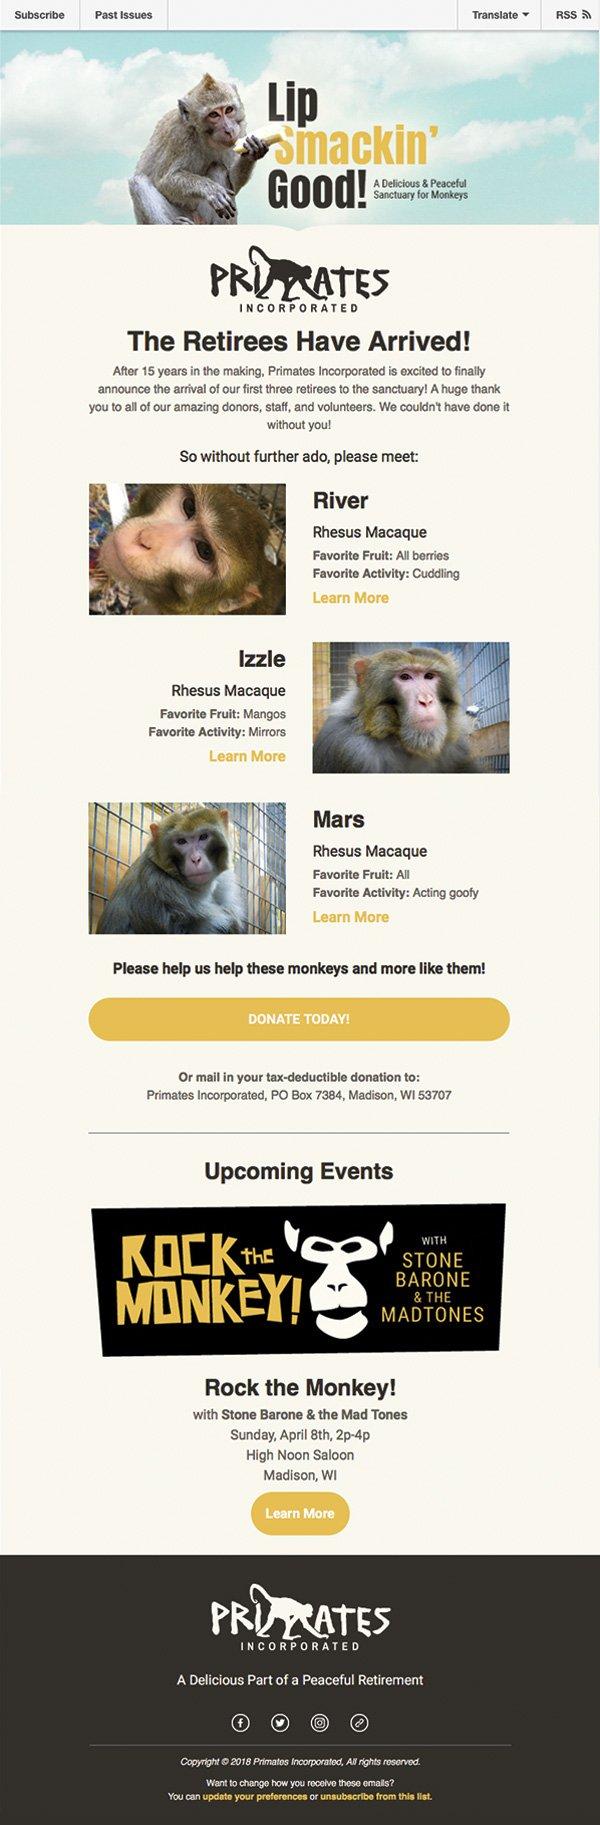 Primates Incorporated enewsletter